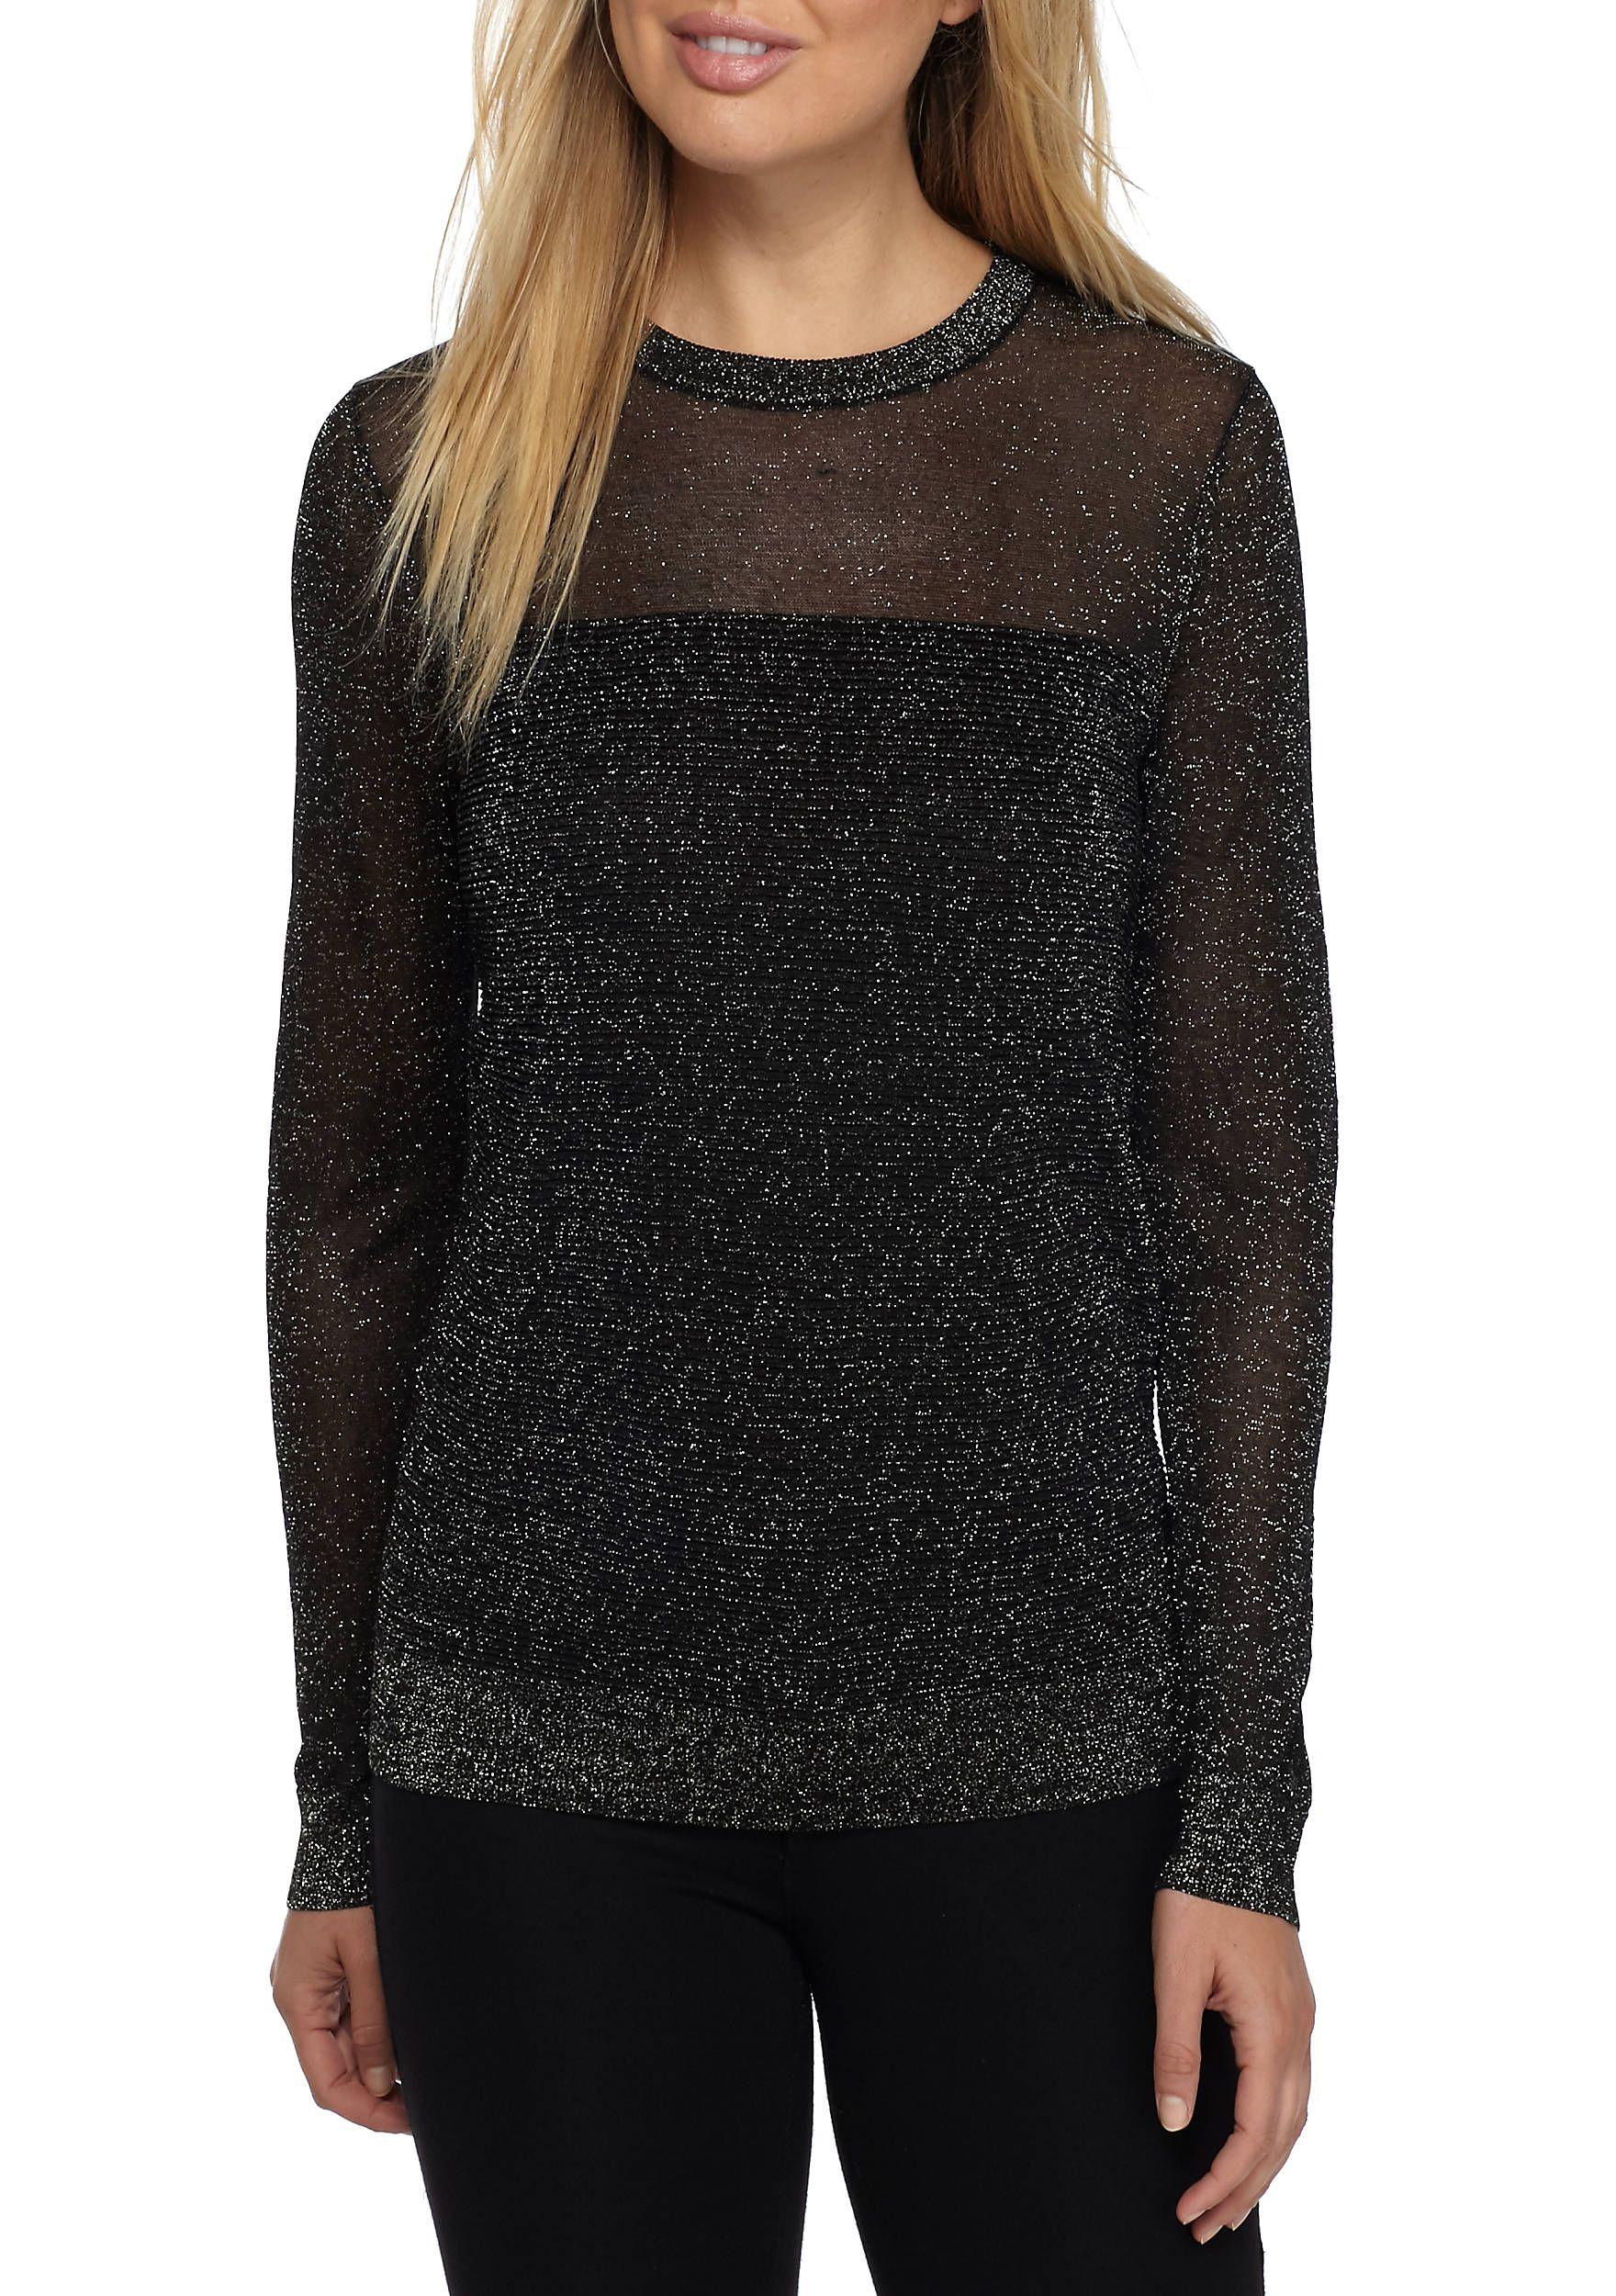 Michael Kors Metallic Crew-Neck Sweater Black gold Women s Clothing Sweaters   BlackGold 1803007MF76NEK7ZL  3fe5029c8